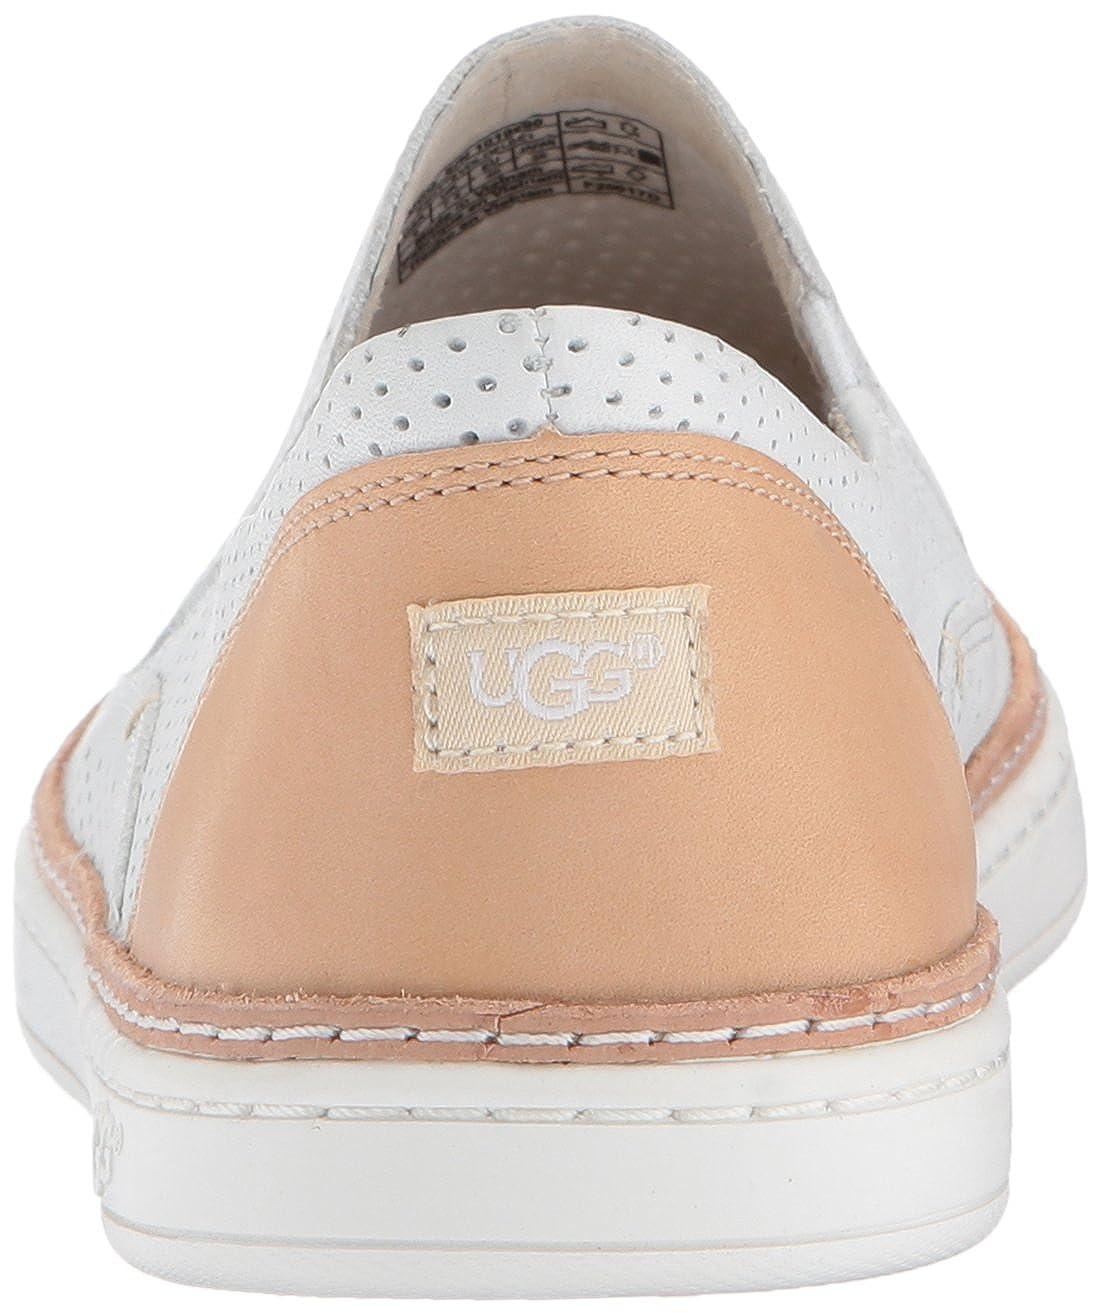 882777b261e UGG Women's Adley Perf Fashion Sneaker